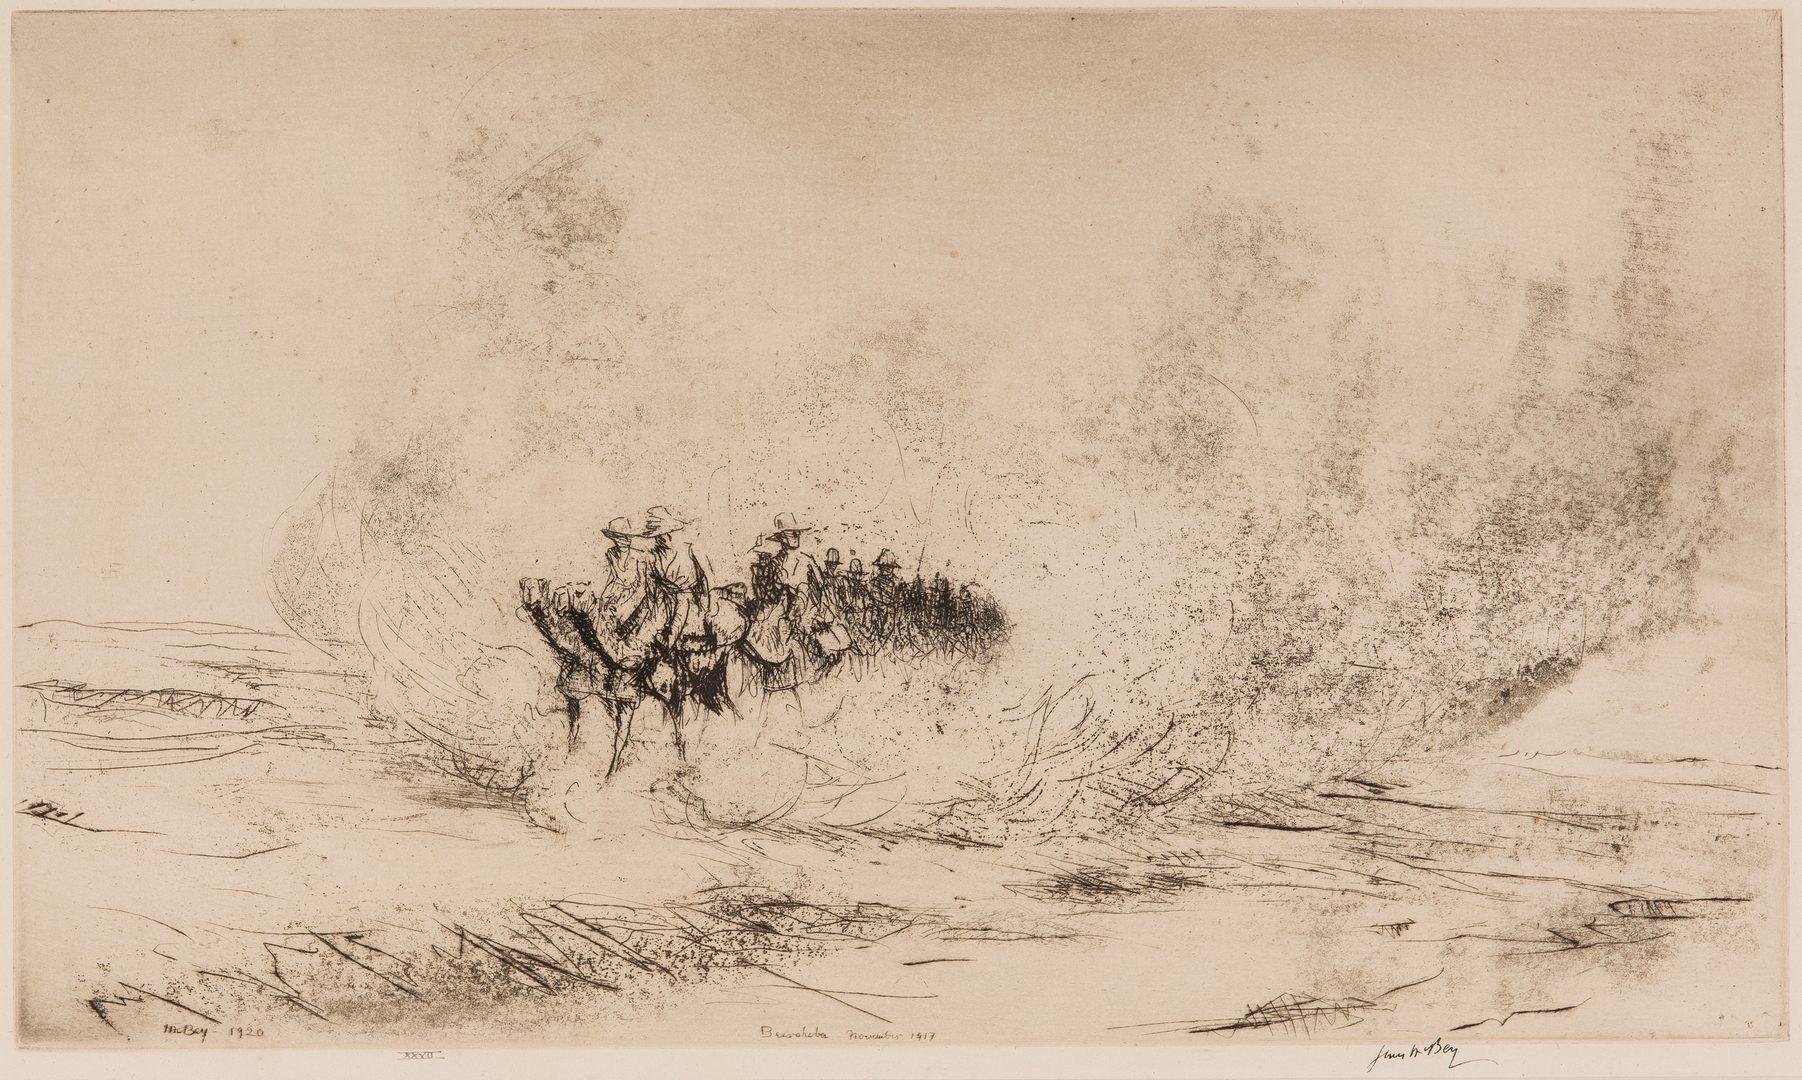 Lot 723: 2 World War I Works on Paper, incl. James McBey, Kerr Eby